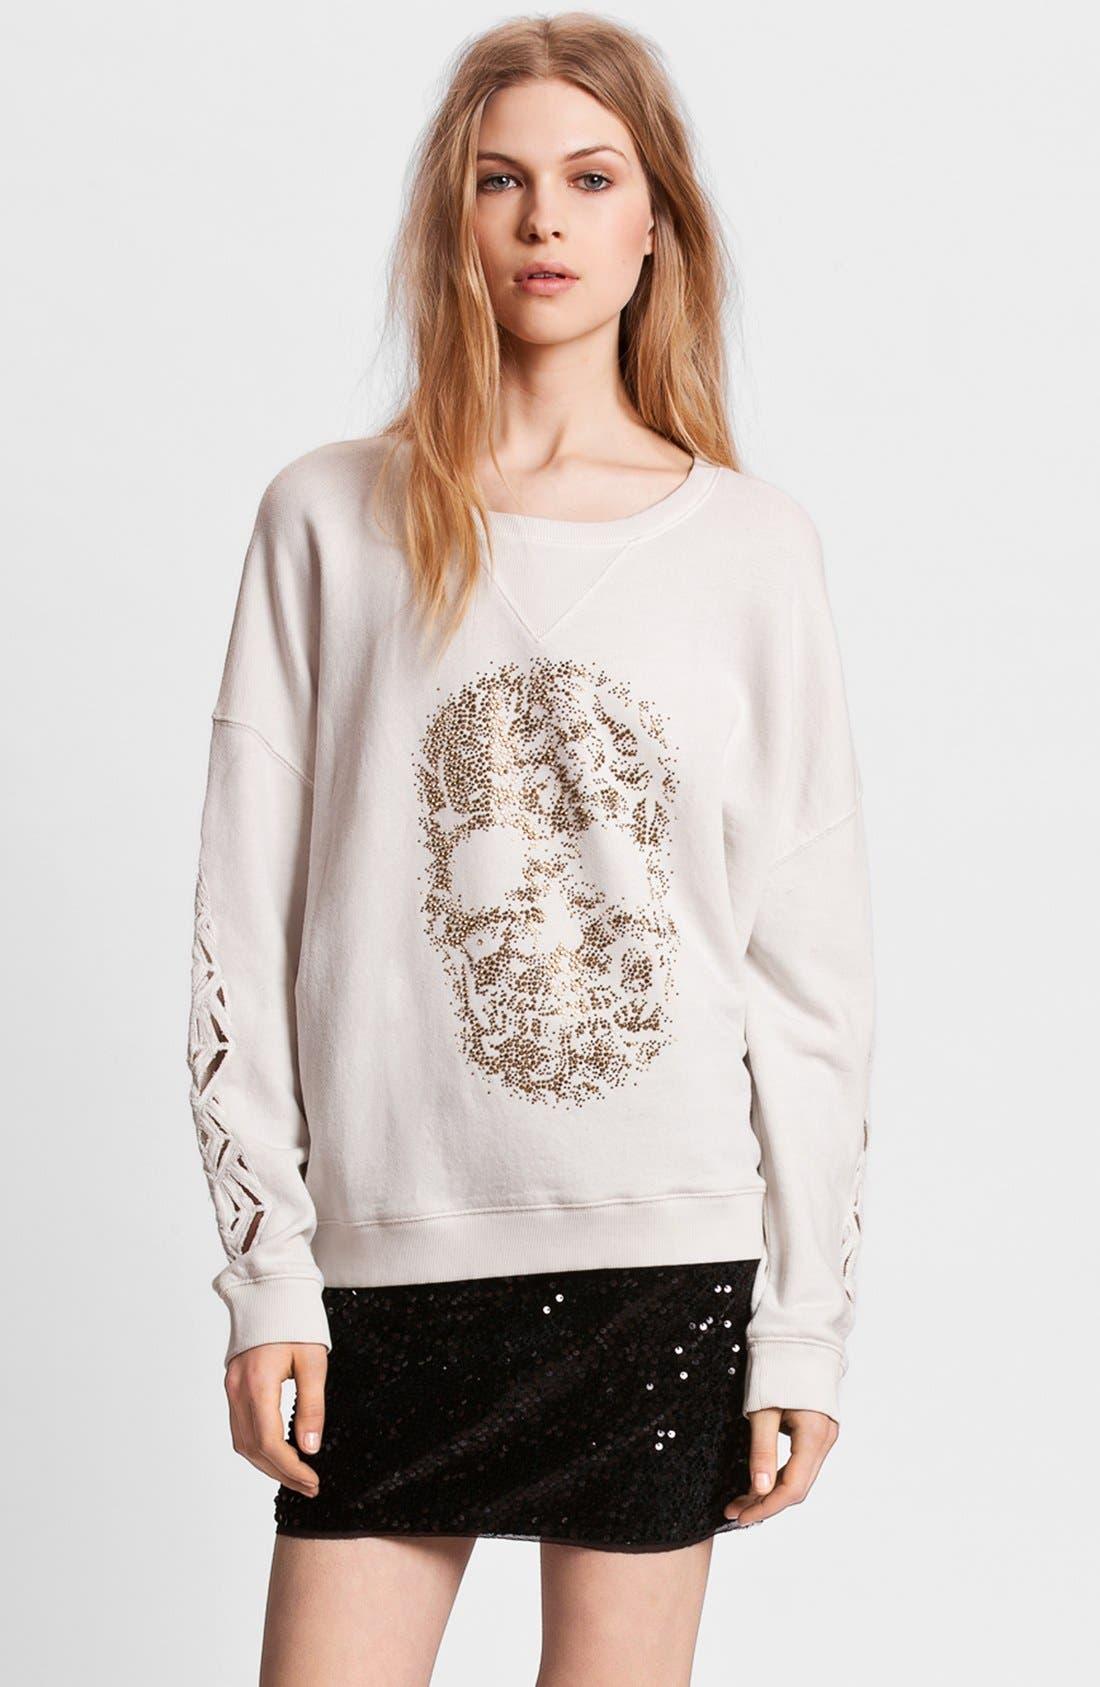 Alternate Image 1 Selected - Zadig & Voltaire 'Sunny' Skull Embellished Sweatshirt